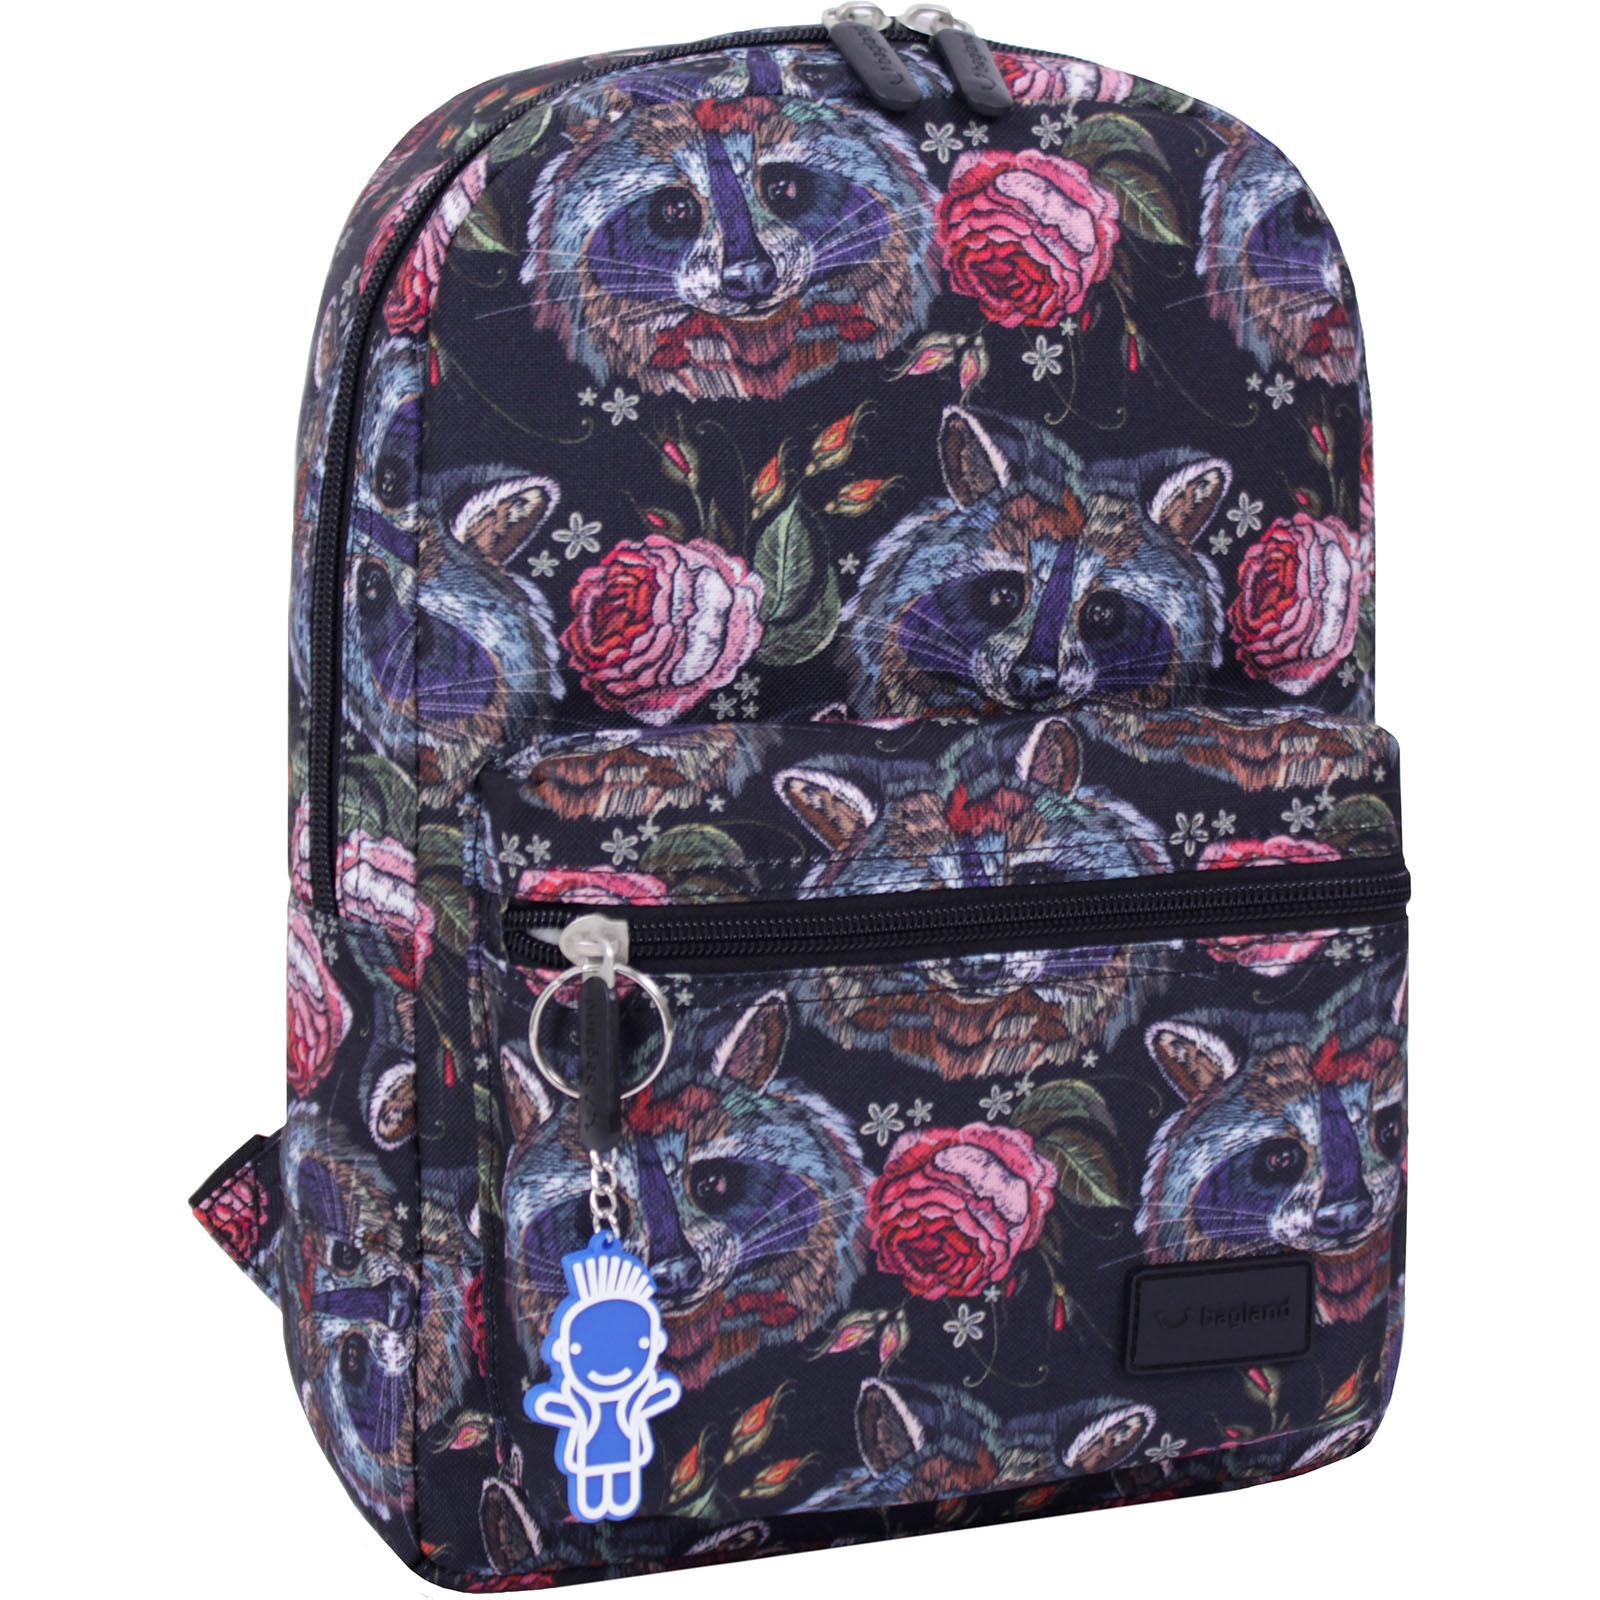 Молодежные рюкзаки Рюкзак Bagland Молодежный mini 8 л. сублимация (477) (00508664) IMG_3719_суб.477_.JPG